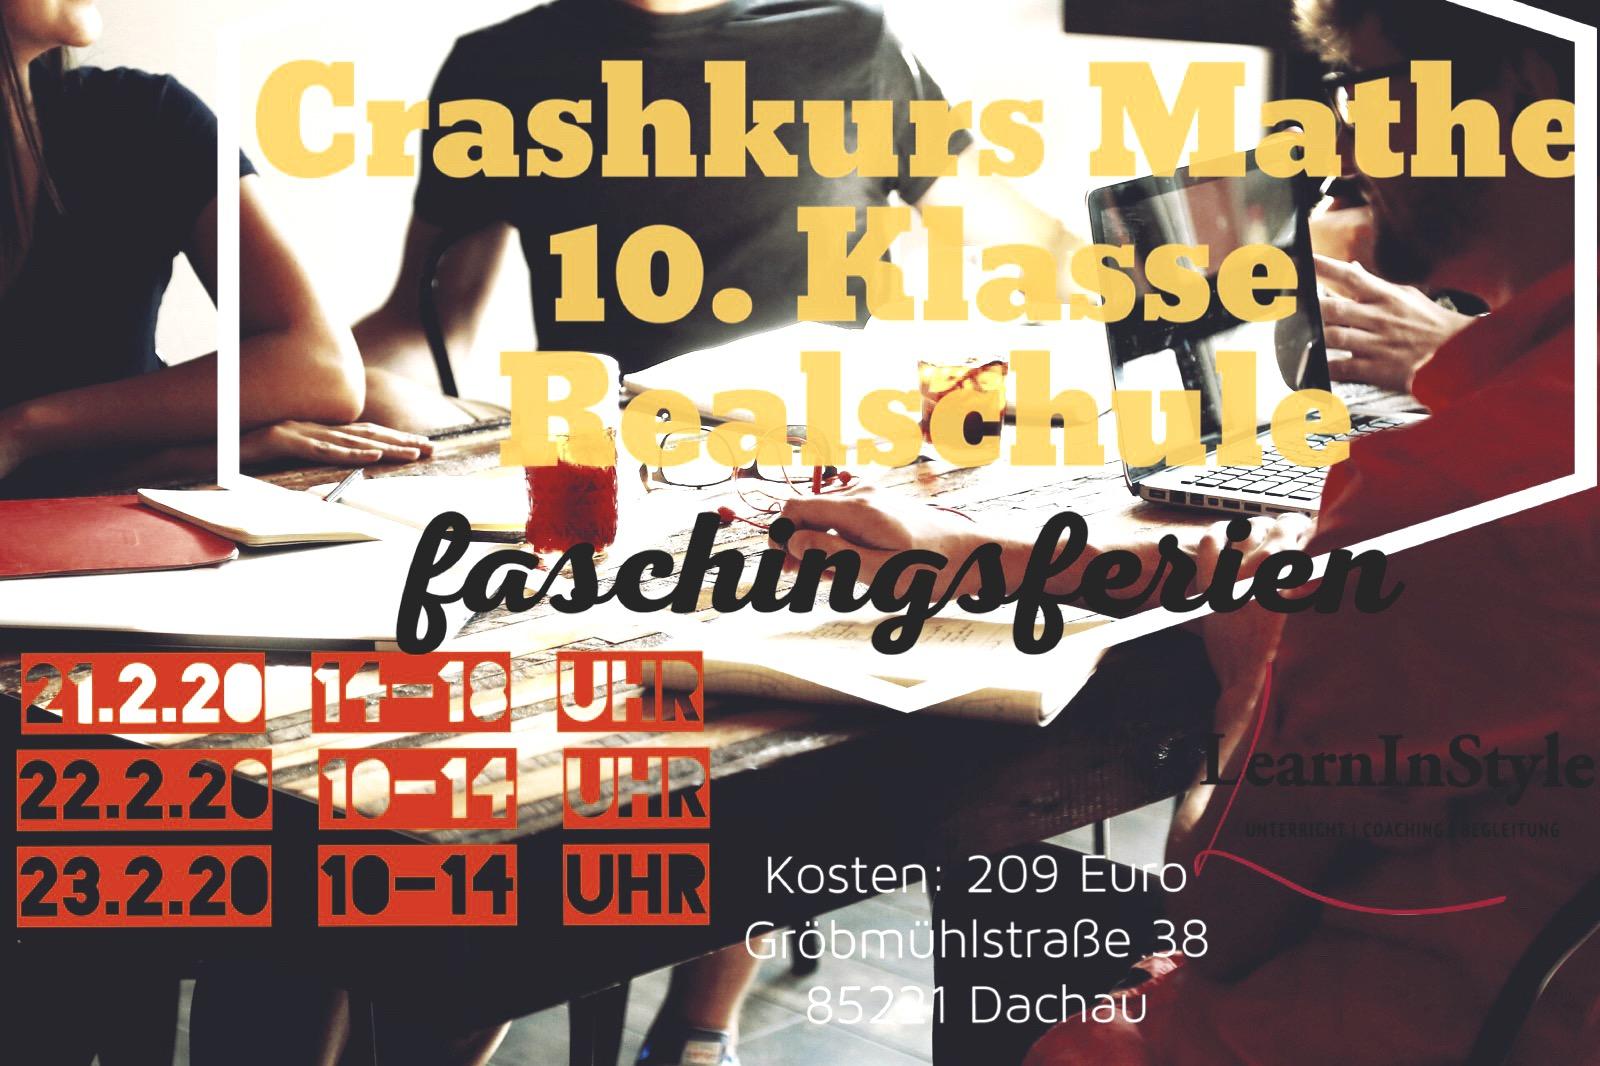 Crashkurs Mathe Faschingsferien – Realschule 10.Klasse